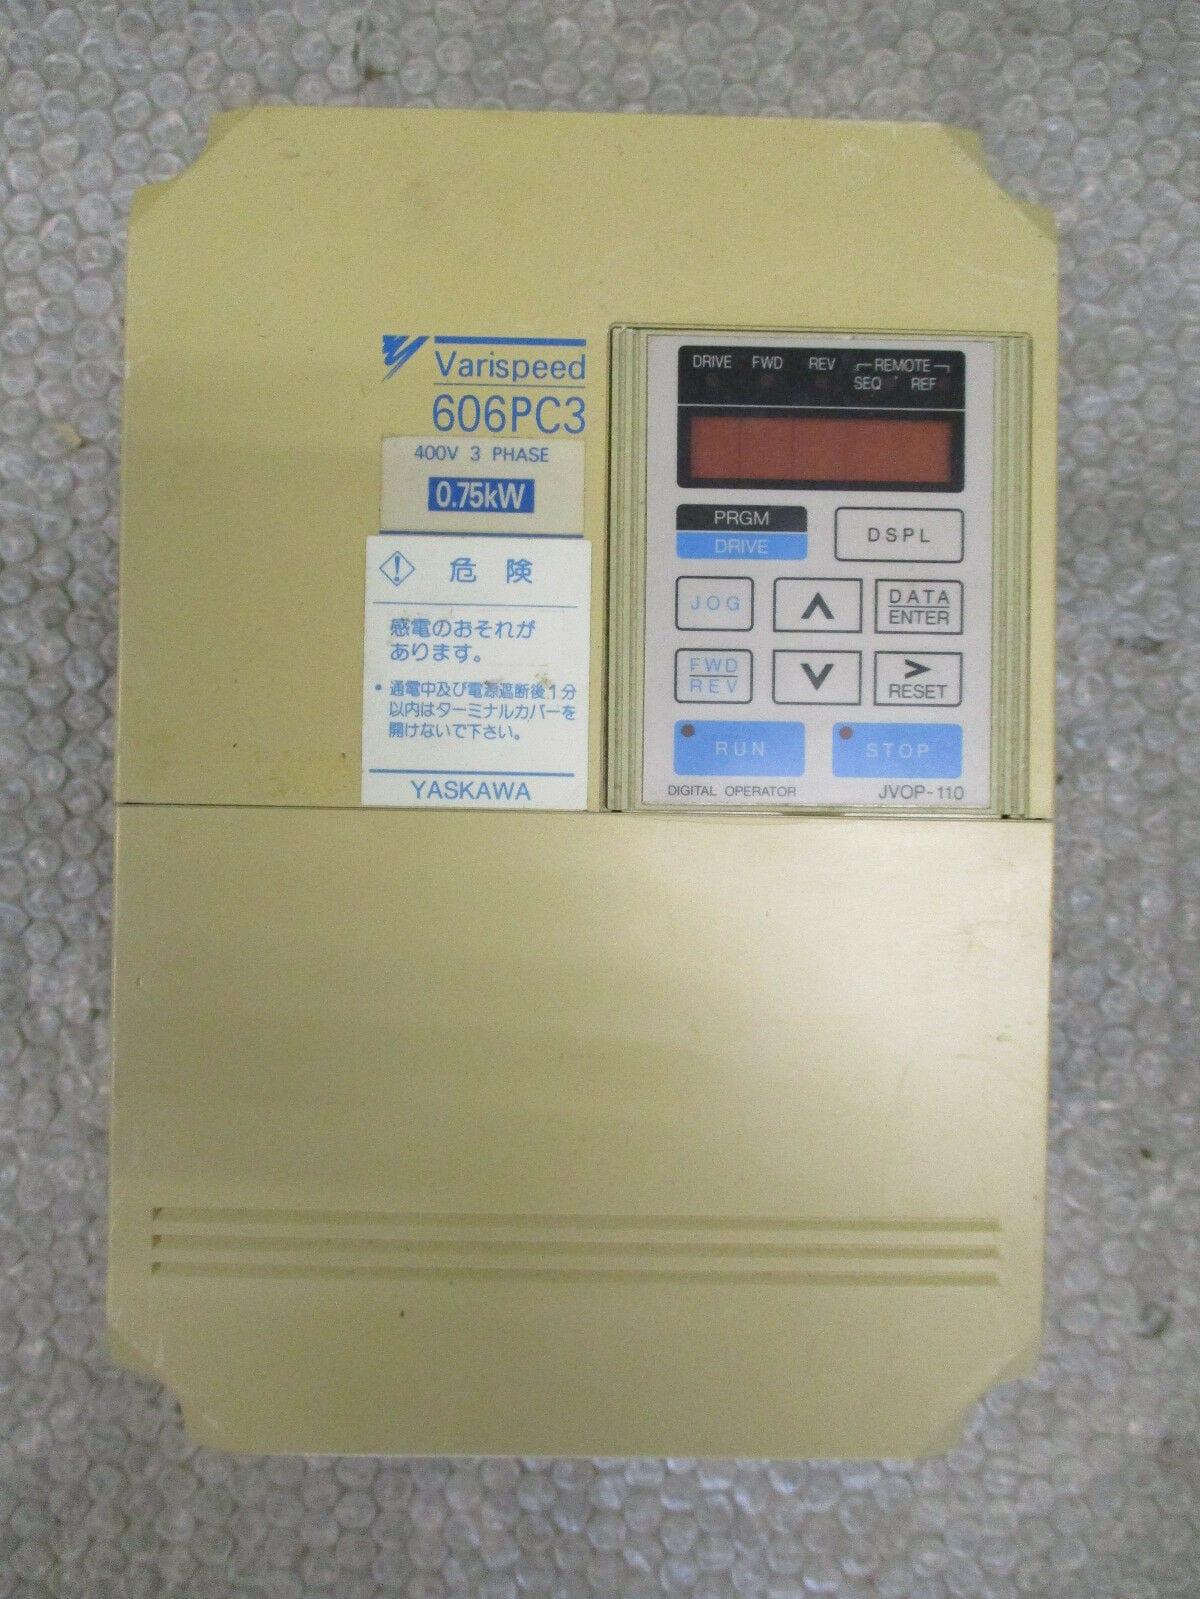 Yaskawa CIMR-PCA40P7 606PC3 Varispeed AC Drive 400VAC 2kVA/ 75kW 2 6A  *Tested*